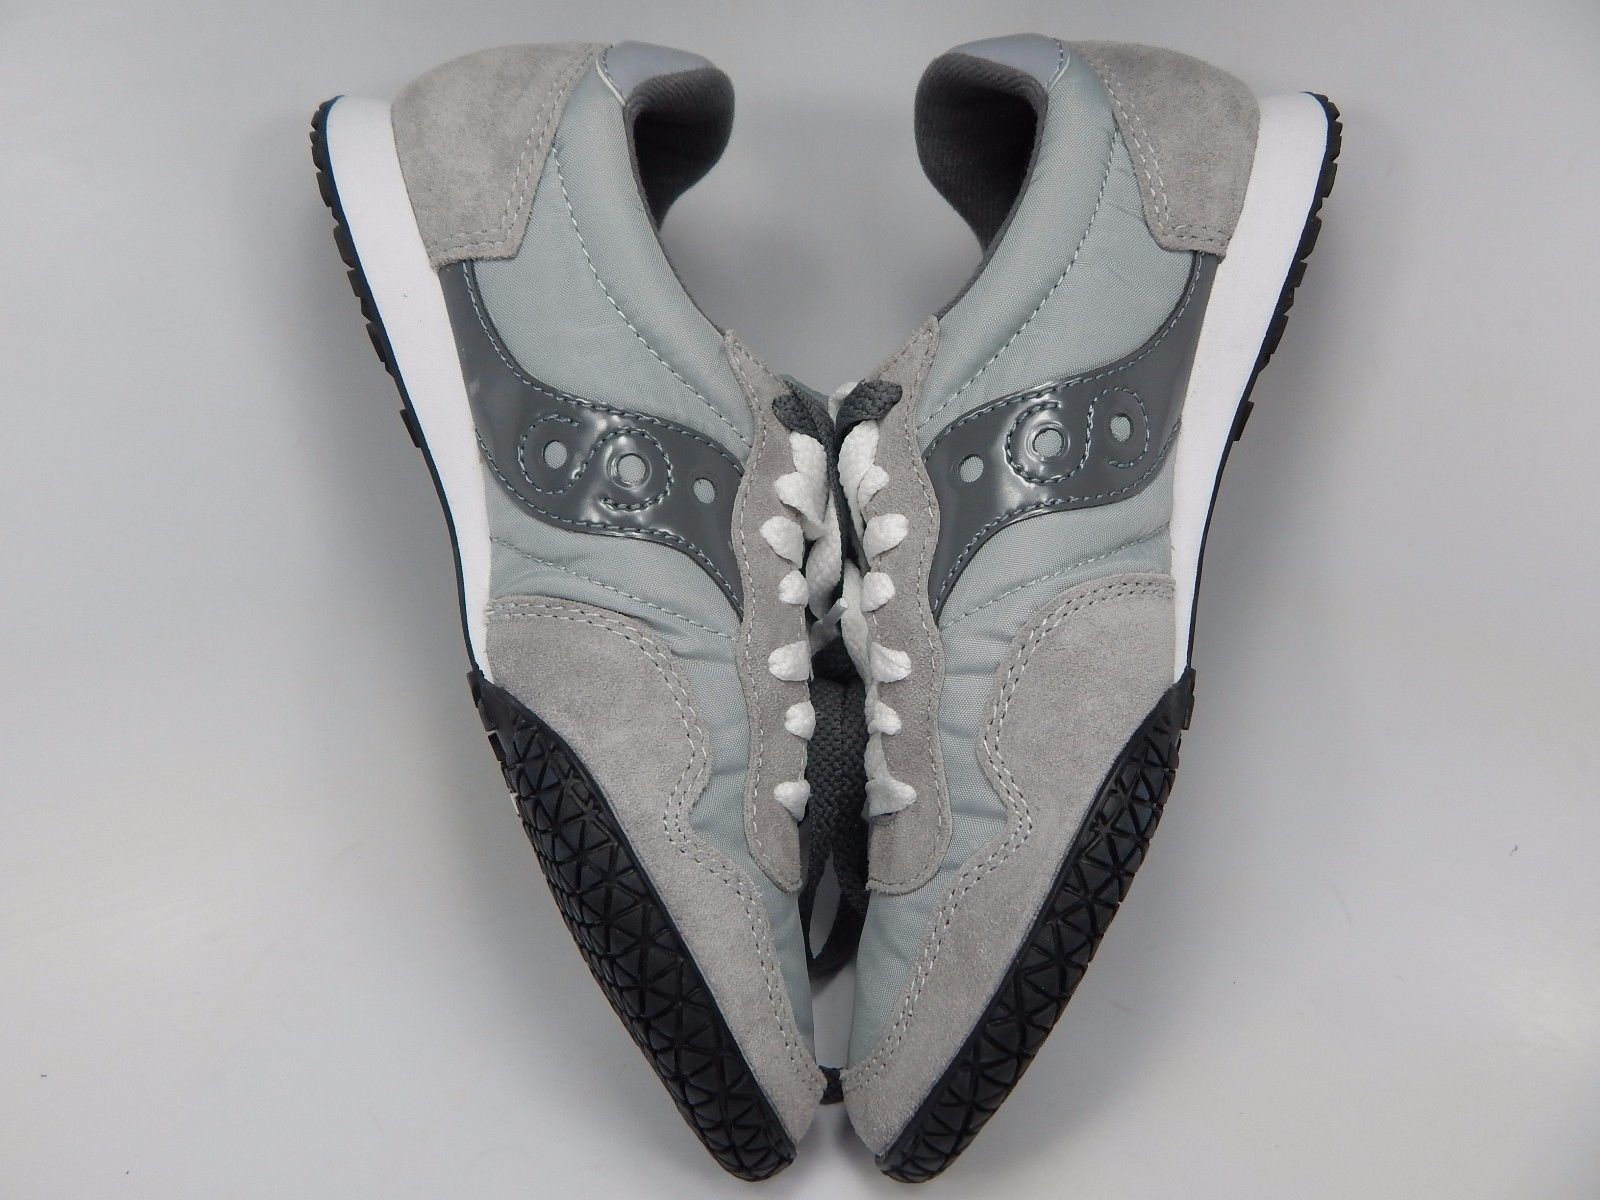 Saucony Original Bullet Women's Running Shoes Size 7 M (B) EU 38 Gray S1943-164